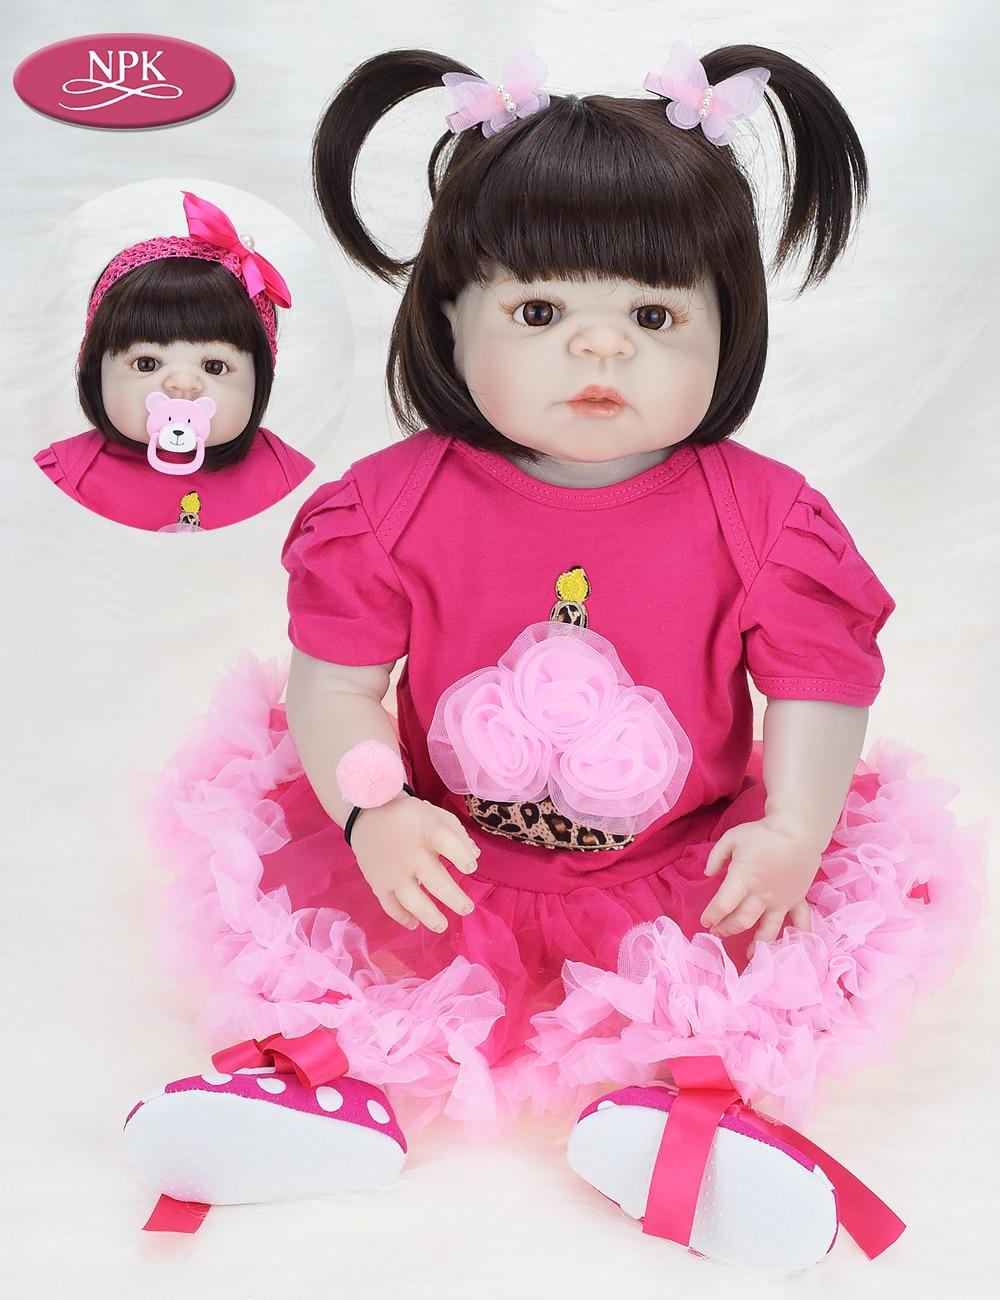 NPK 57CM Full Body Soft Silicone Girls Reborn Baby Doll Bathe Toys Lifelike Princess Girl Dolls Bebe Real Reborn Boneca Menina  (10)